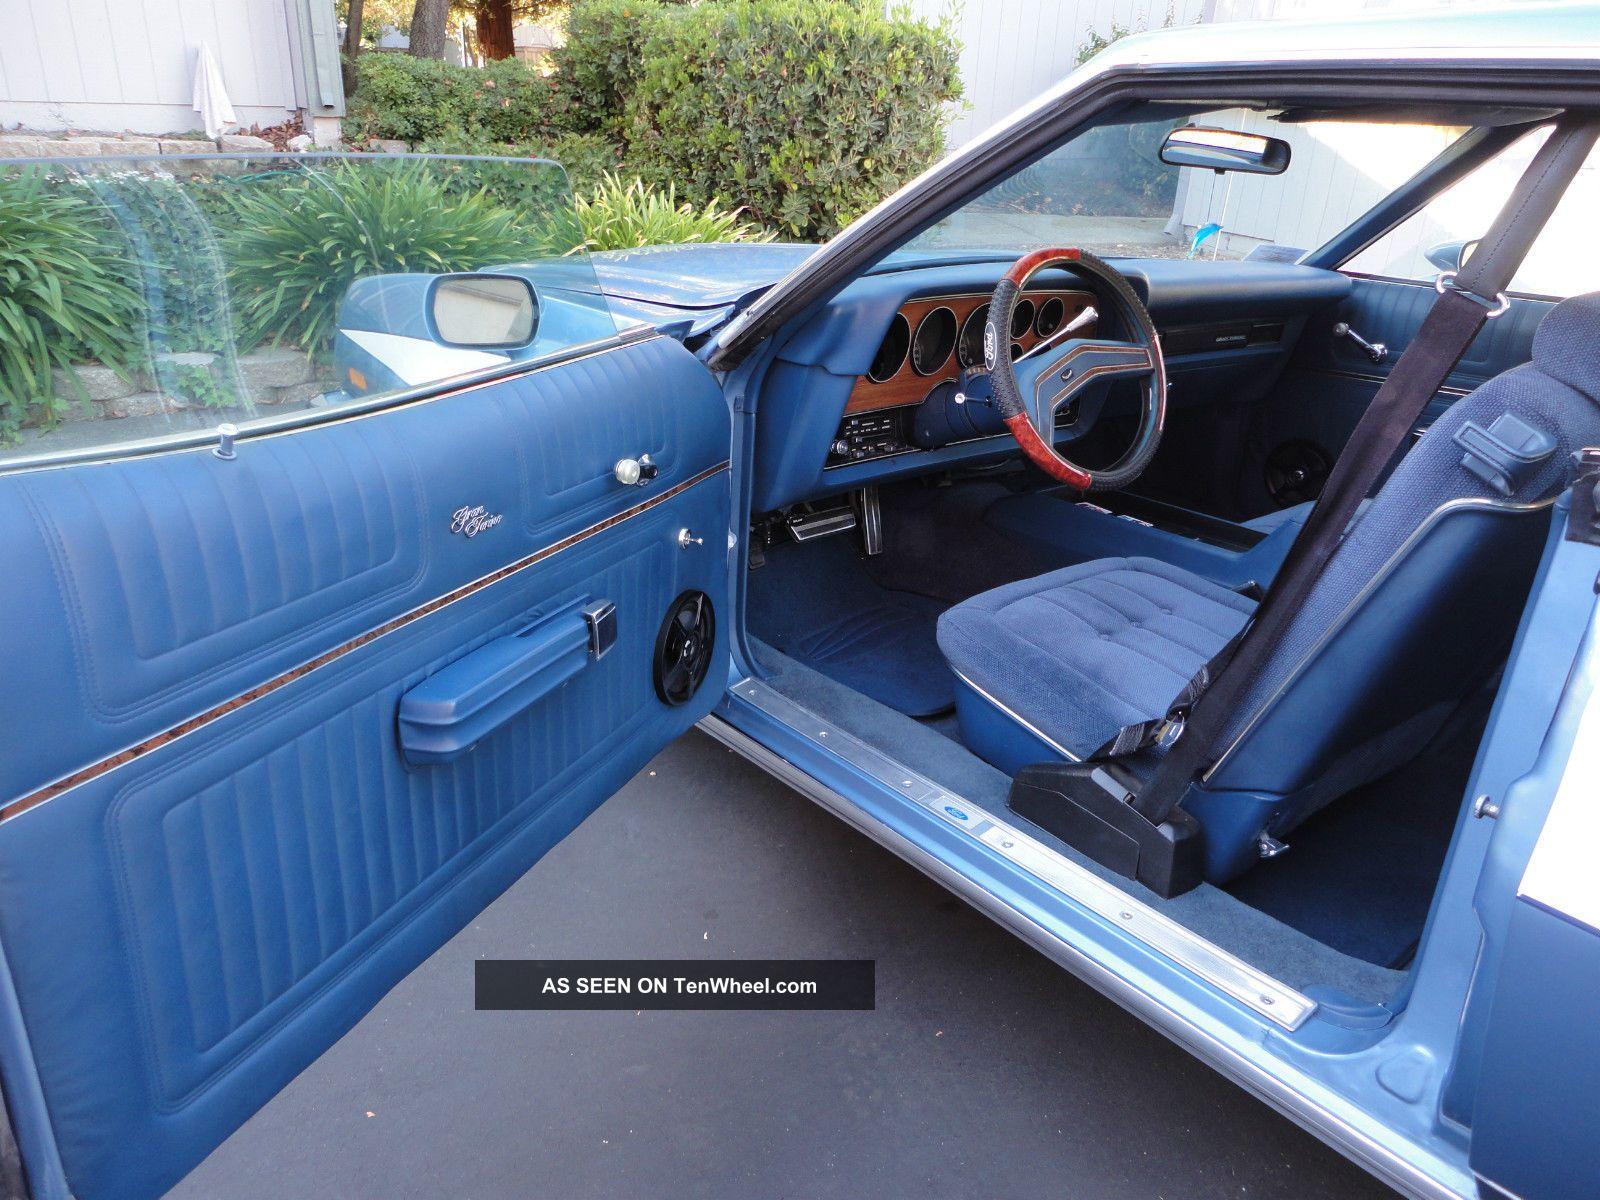 1975 ford gran torino sport car unique starsky hutch paint job. Black Bedroom Furniture Sets. Home Design Ideas